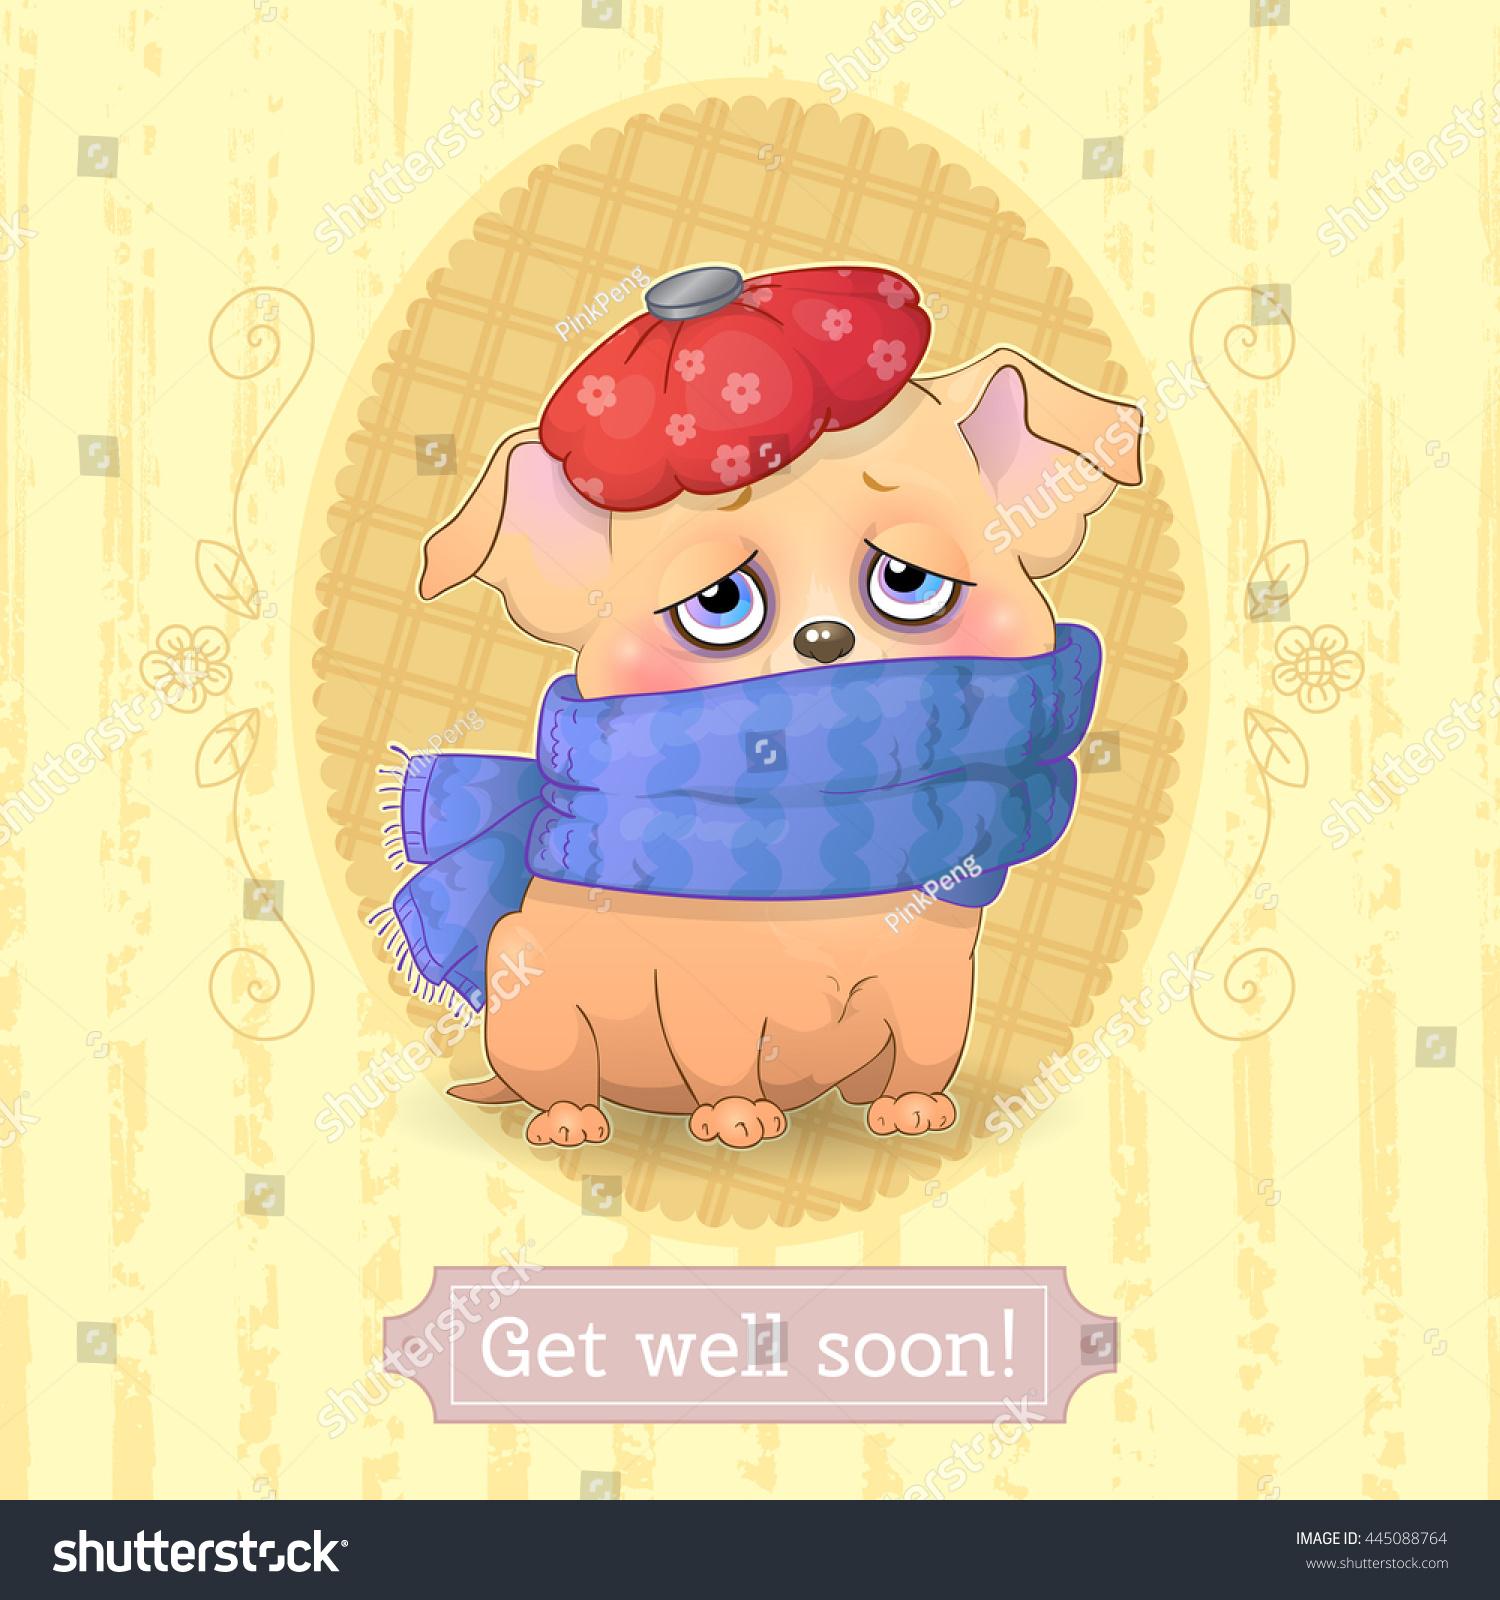 Get Well Soon Cartoon Vector Greeting Stock Vector Royalty Free